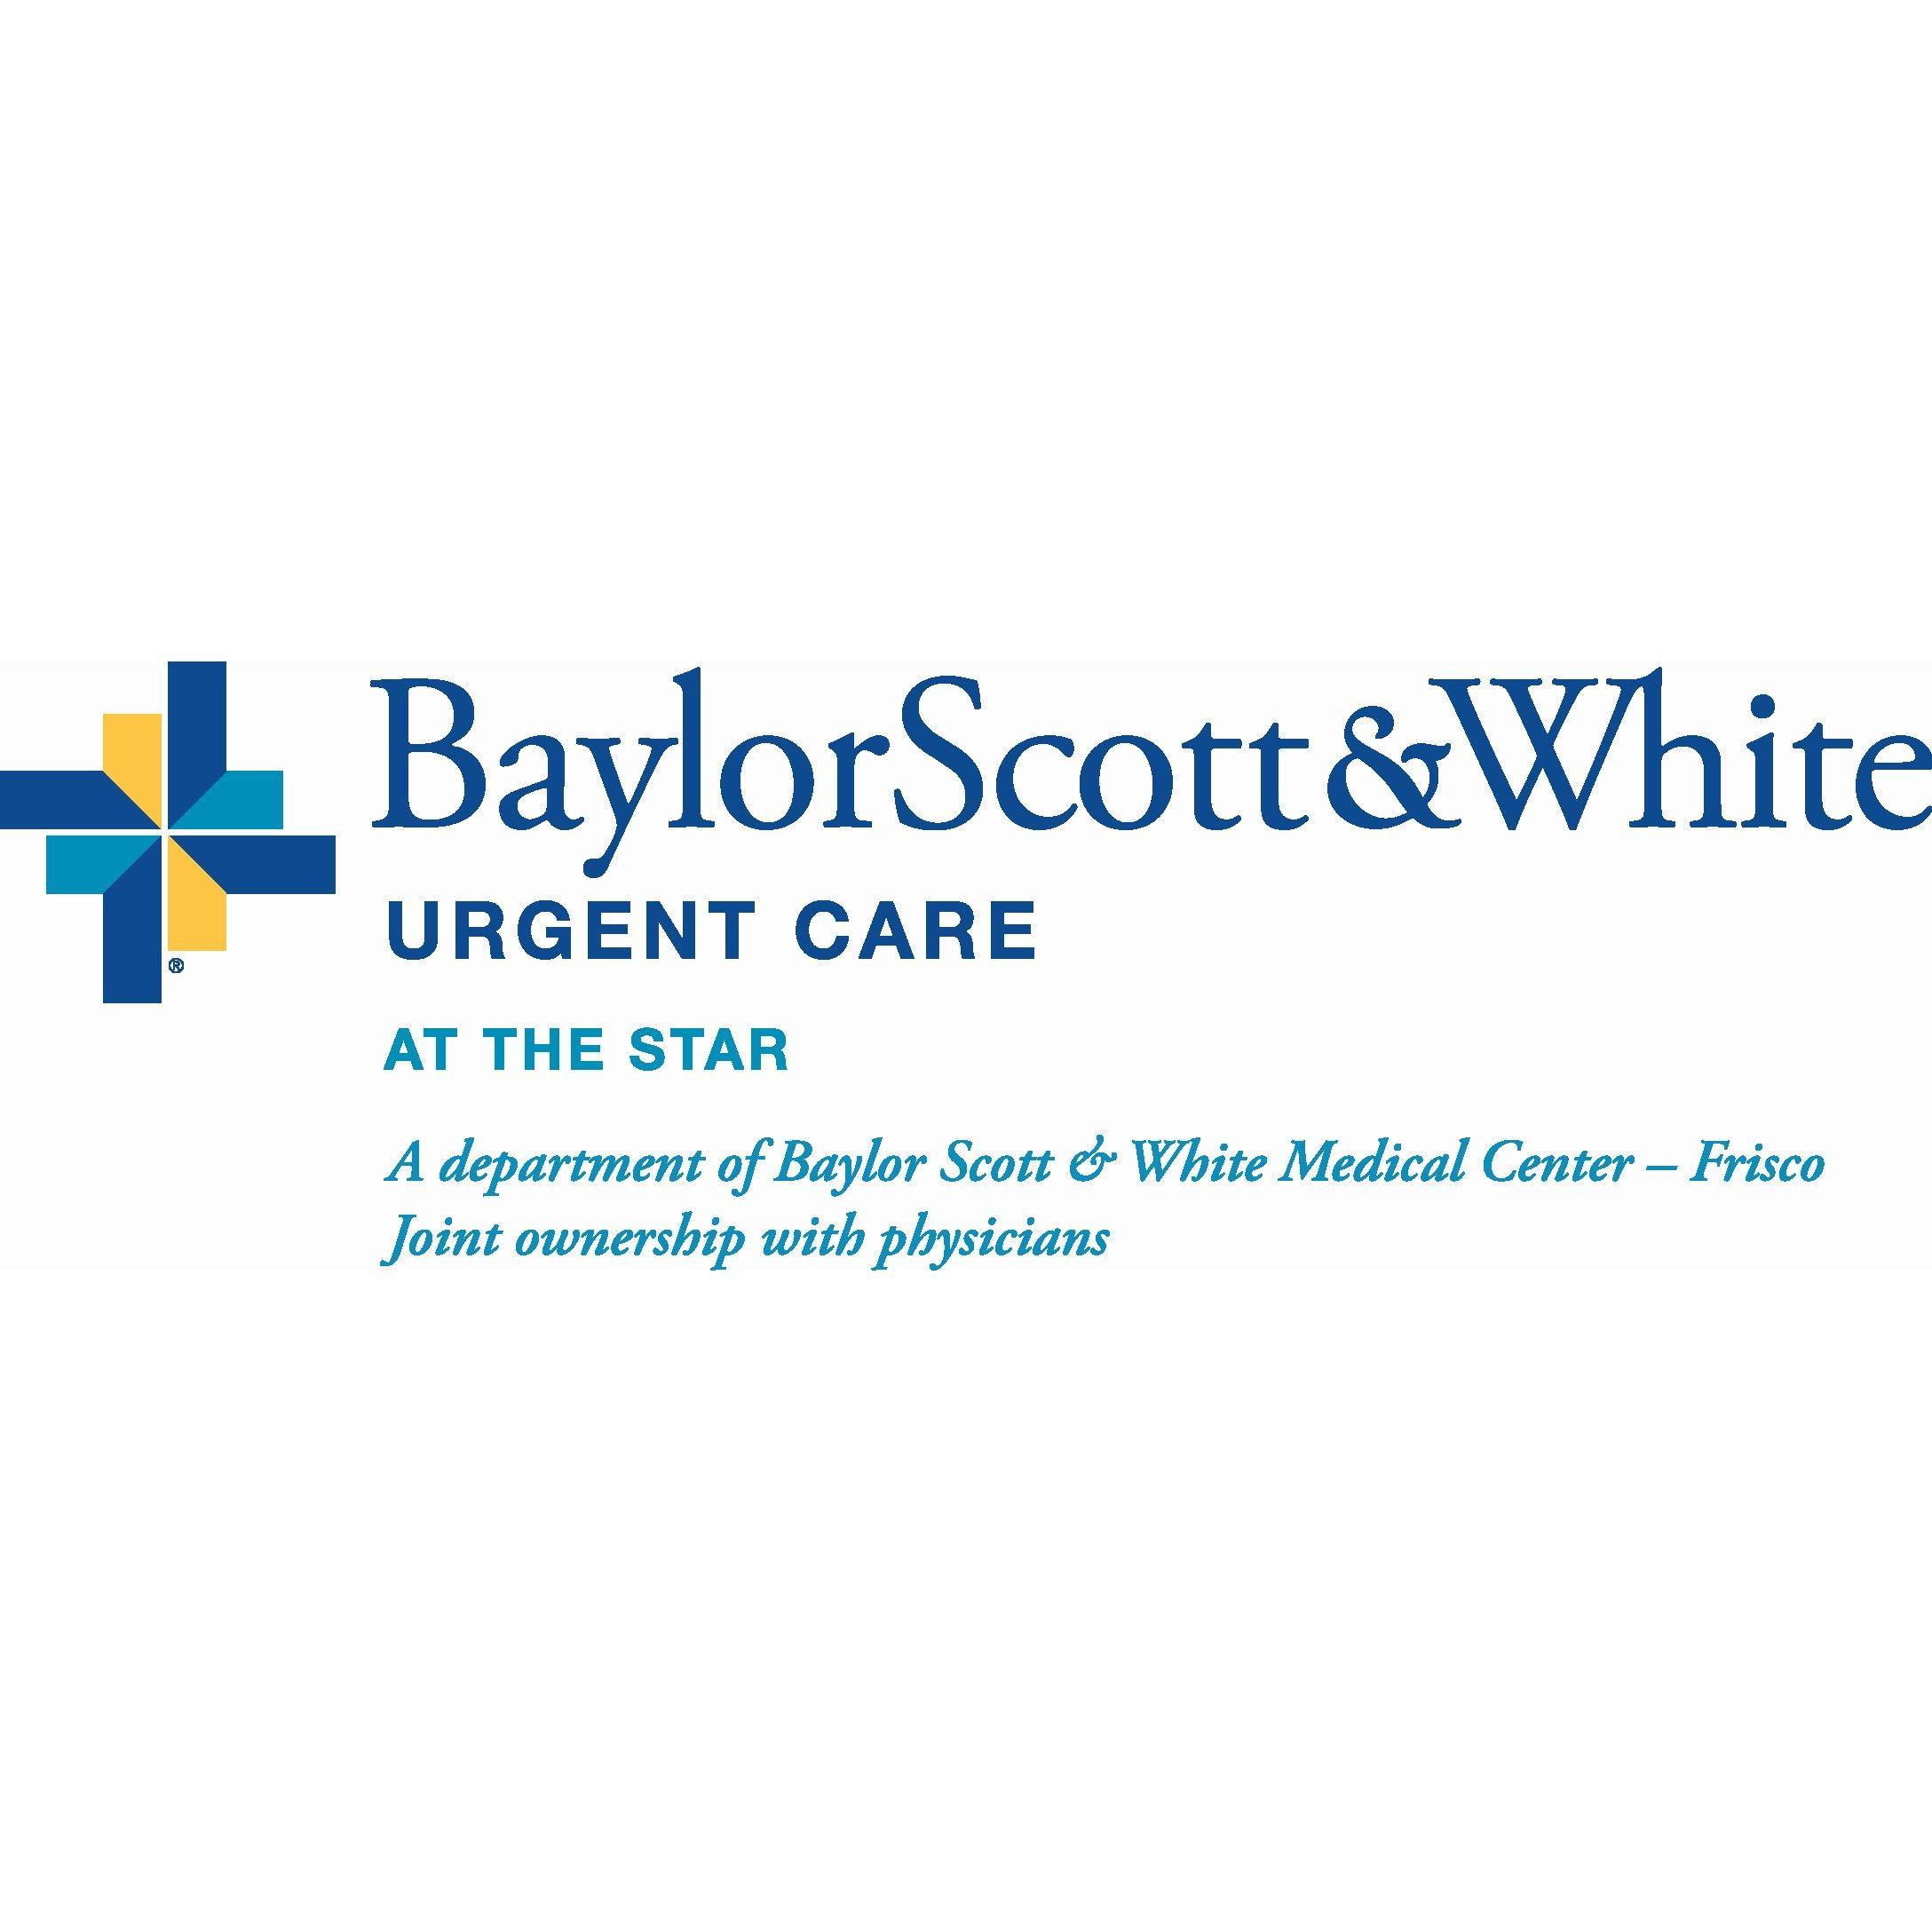 Baylor Scott & White Urgent Care at the STAR - Frisco, TX - Emergency Medicine